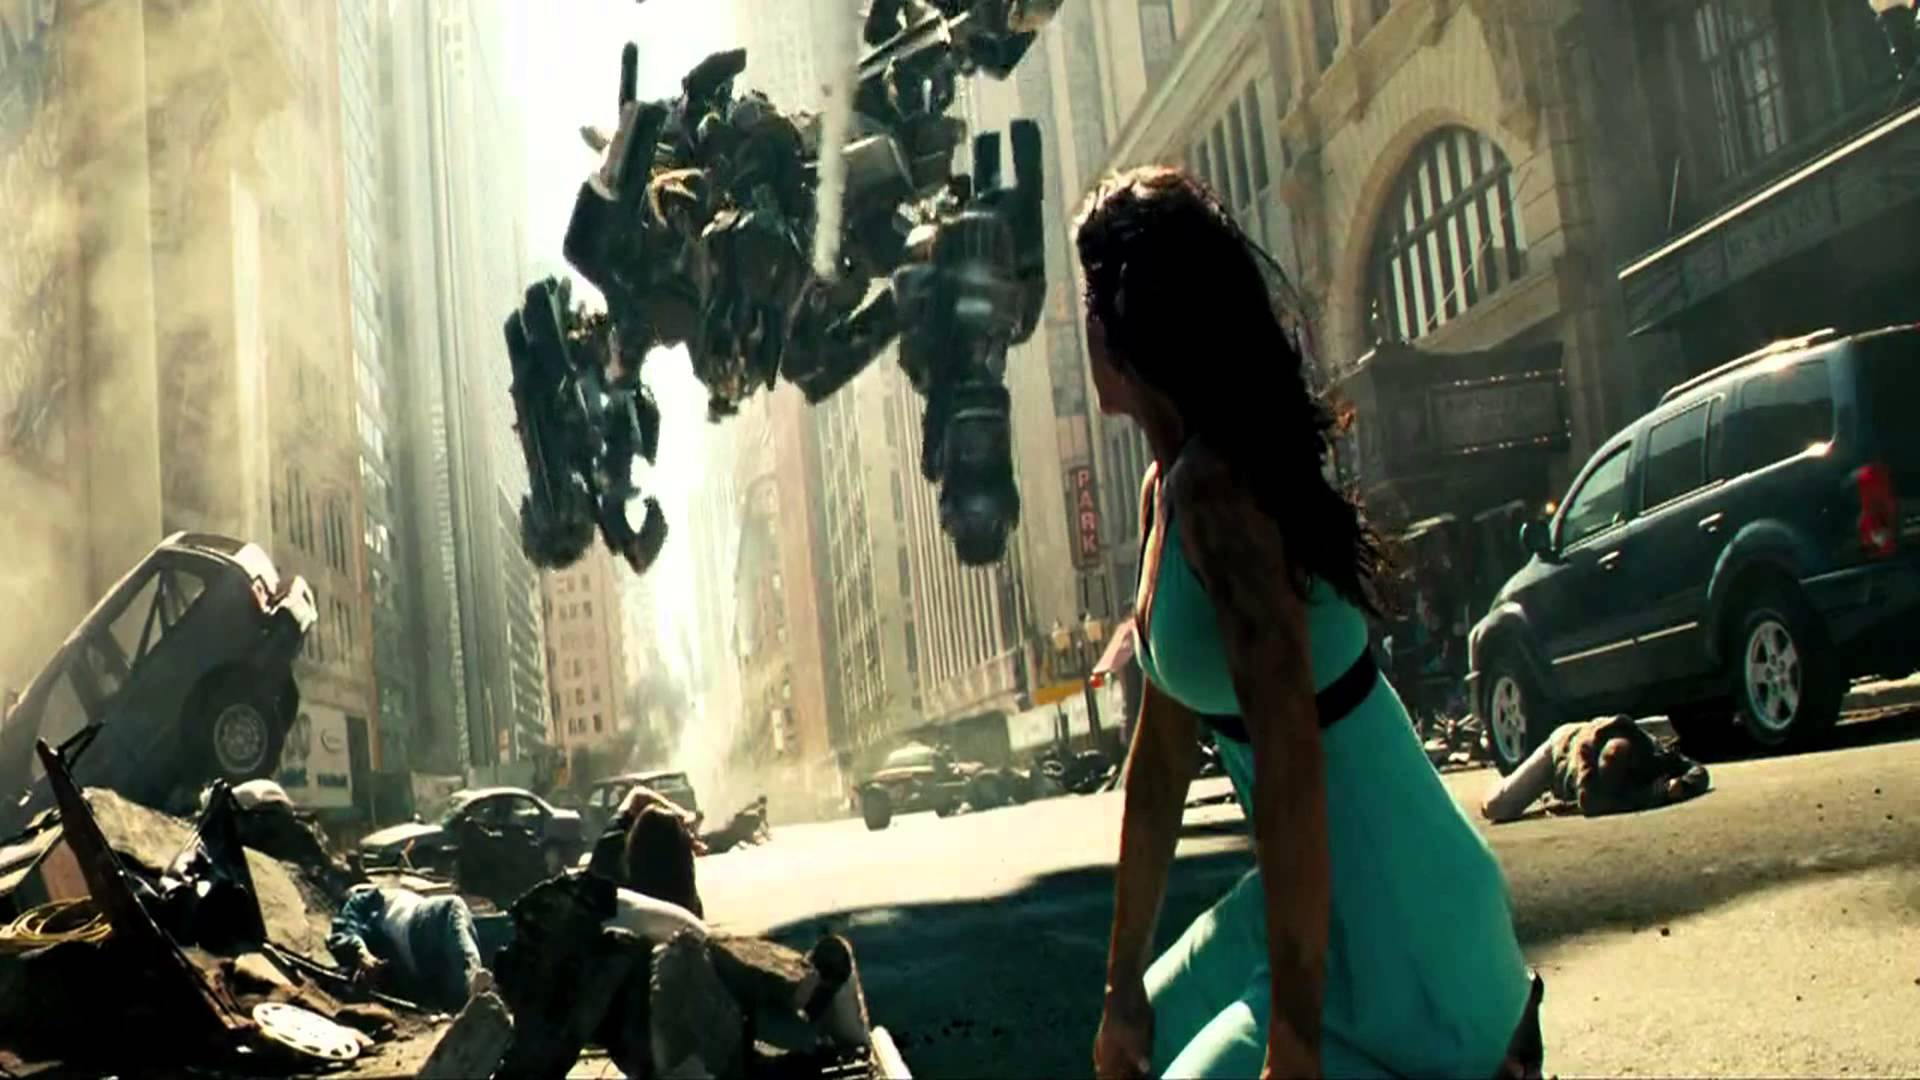 Transformers 1 - City Fight HQ (Brawl Vs Autobots) - YouTube